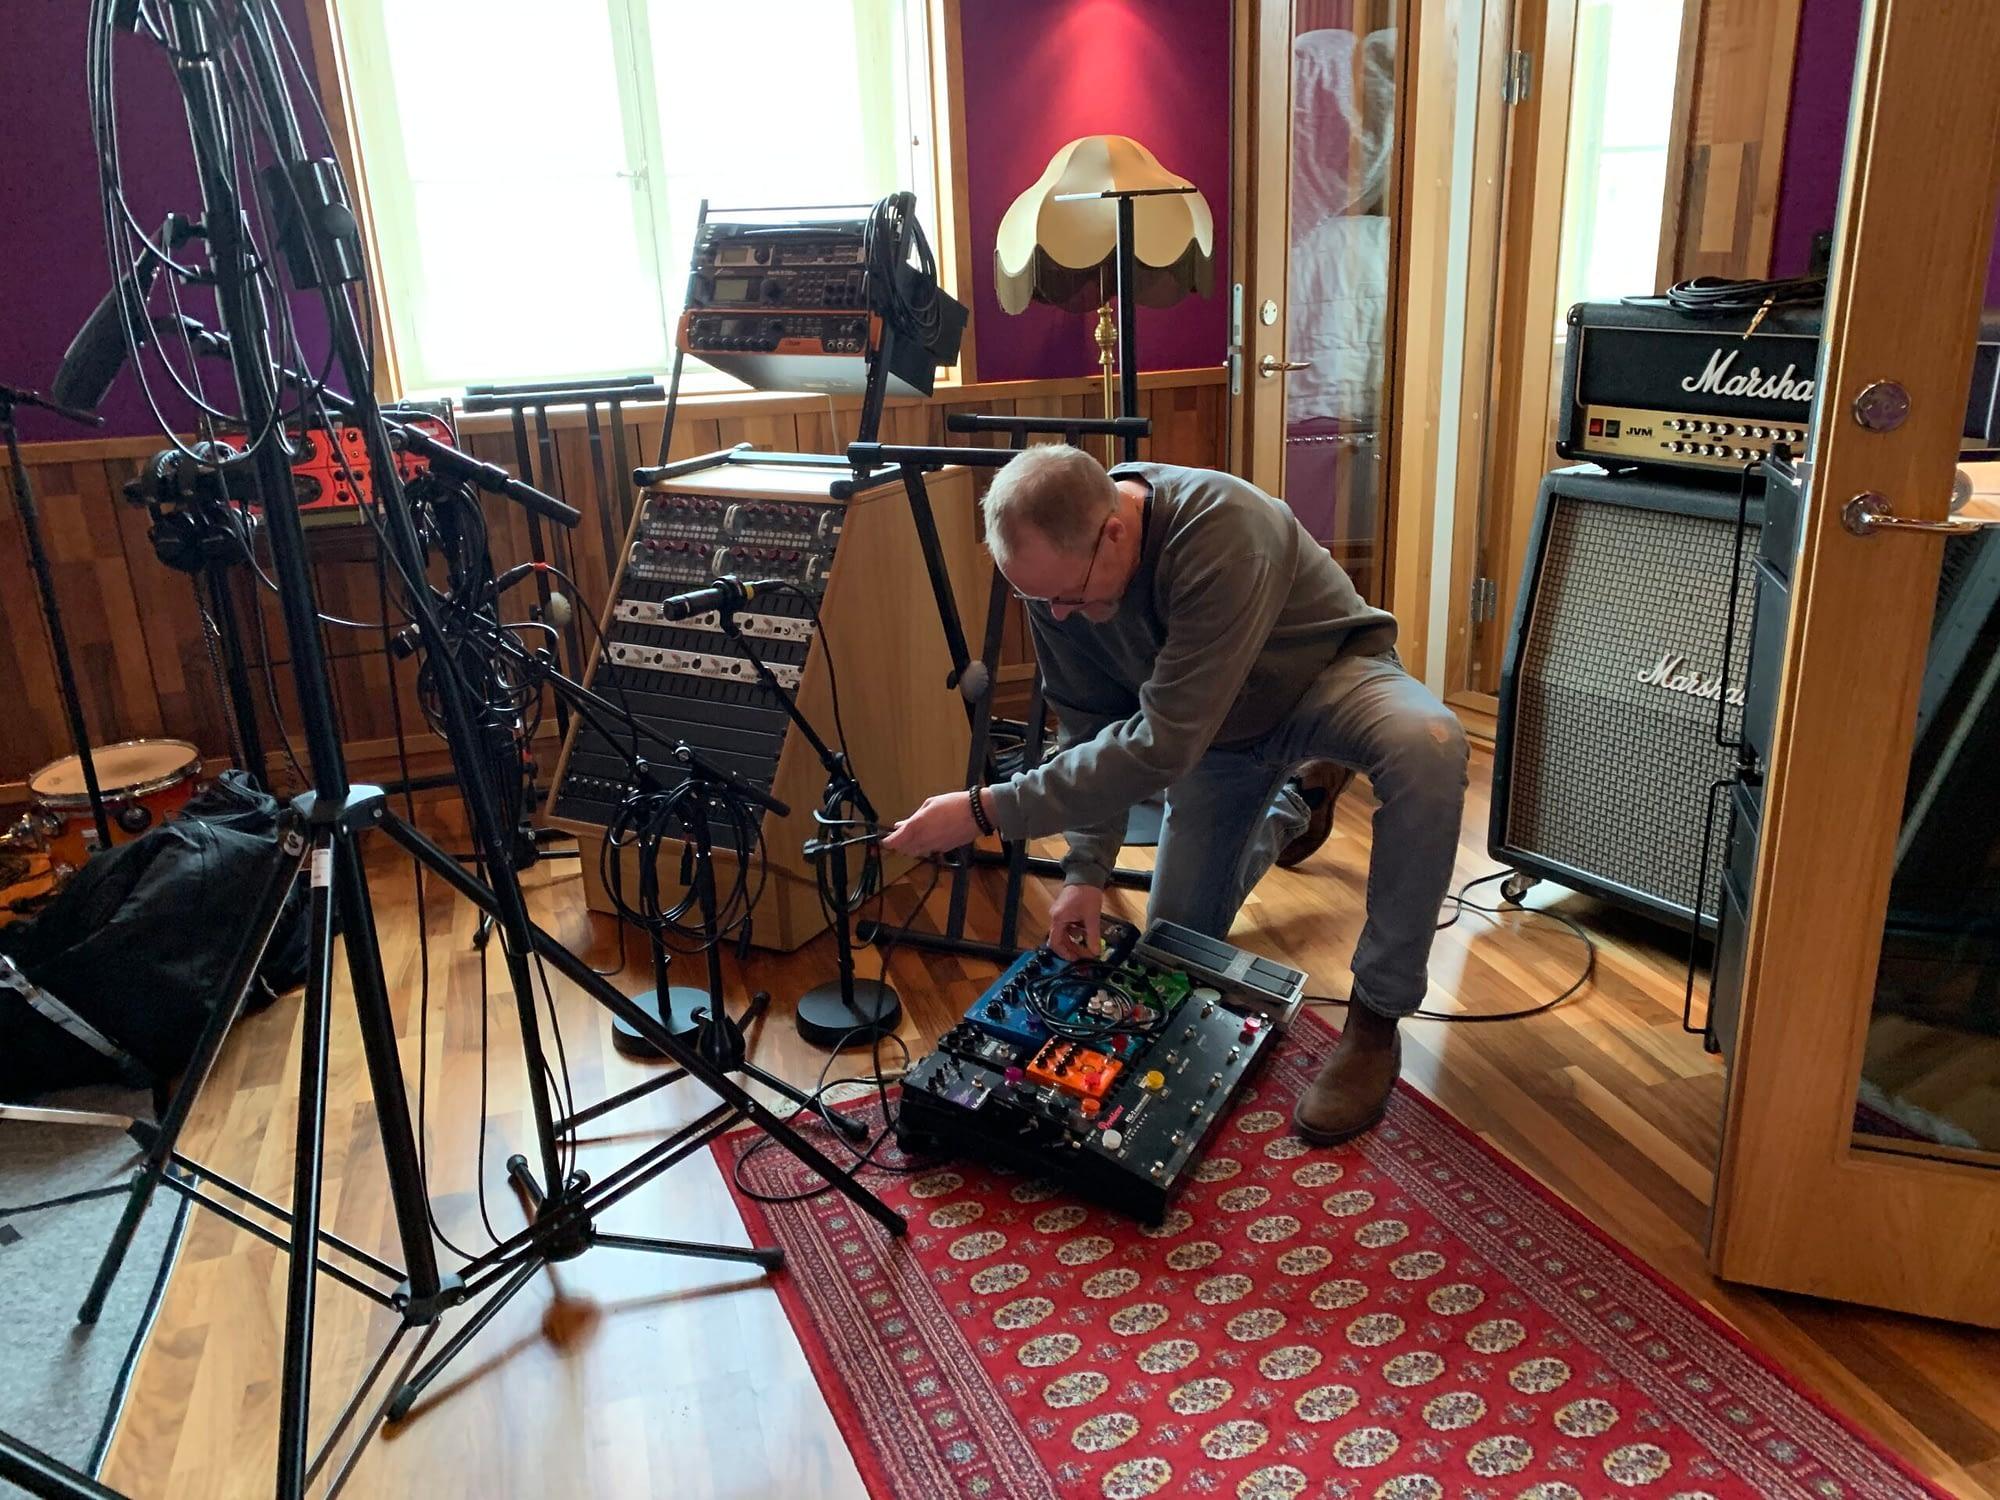 Guitarist Peter Enström prepares his guitar rig for recording